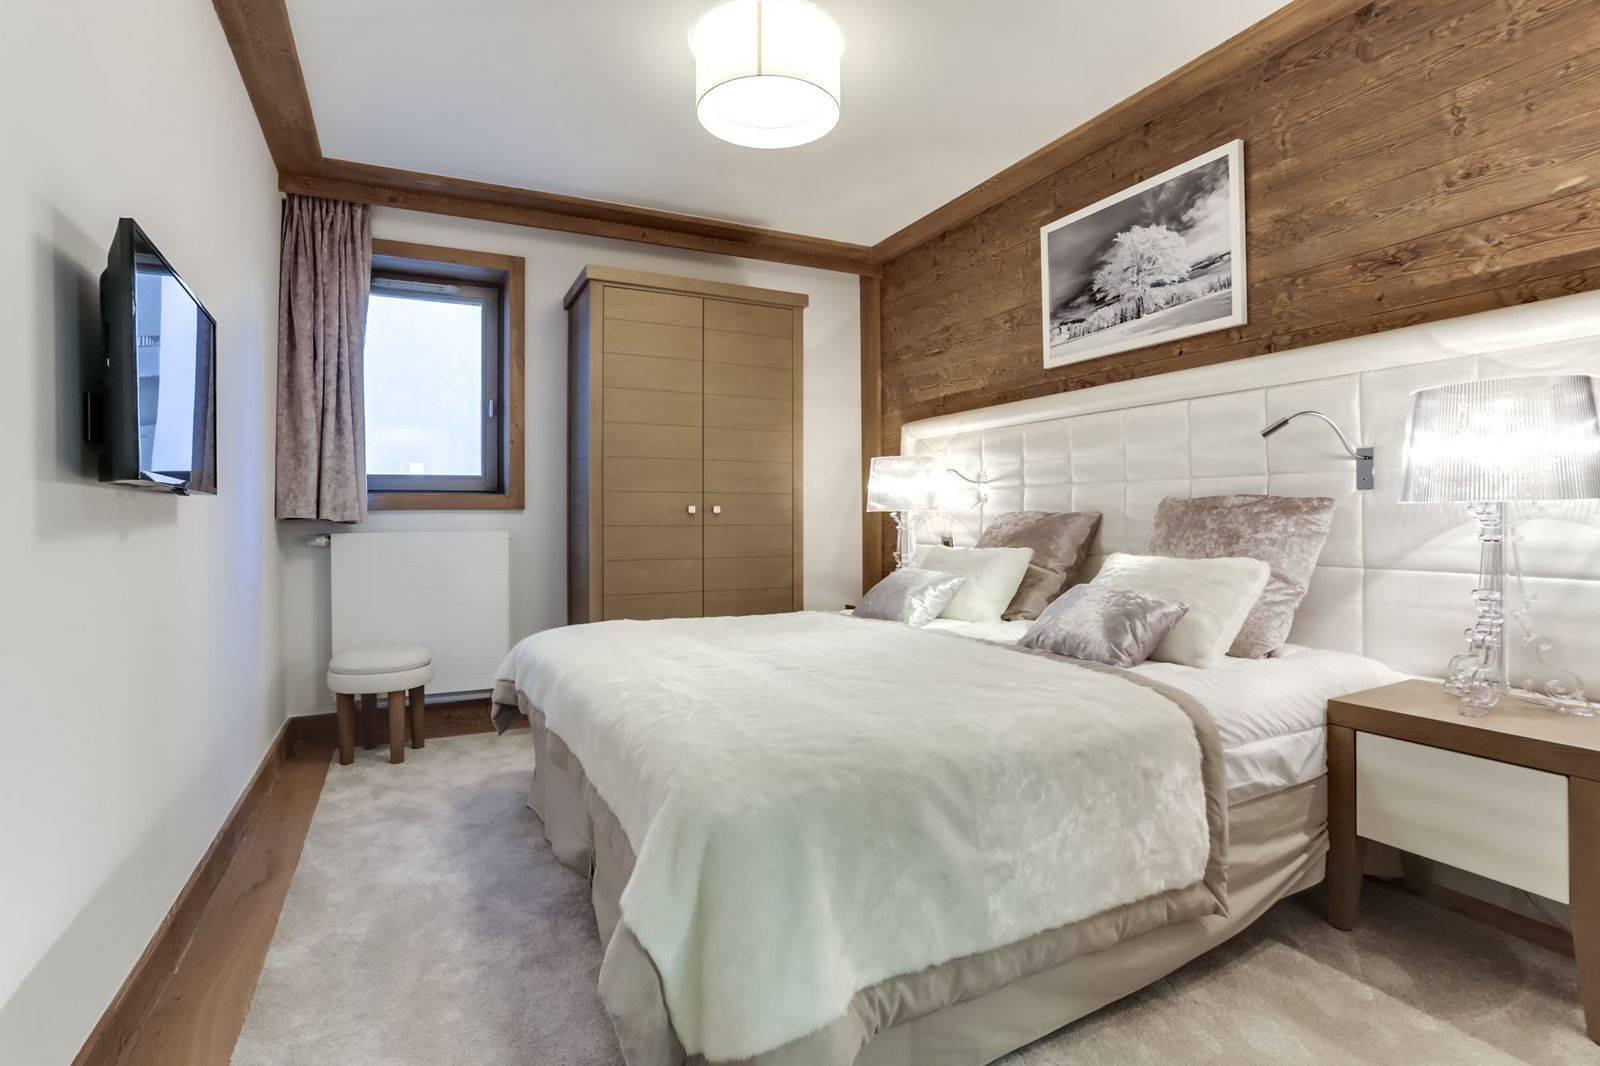 Courchevel 1550 Luxury Rental Appartment Telikia Bedroom 5